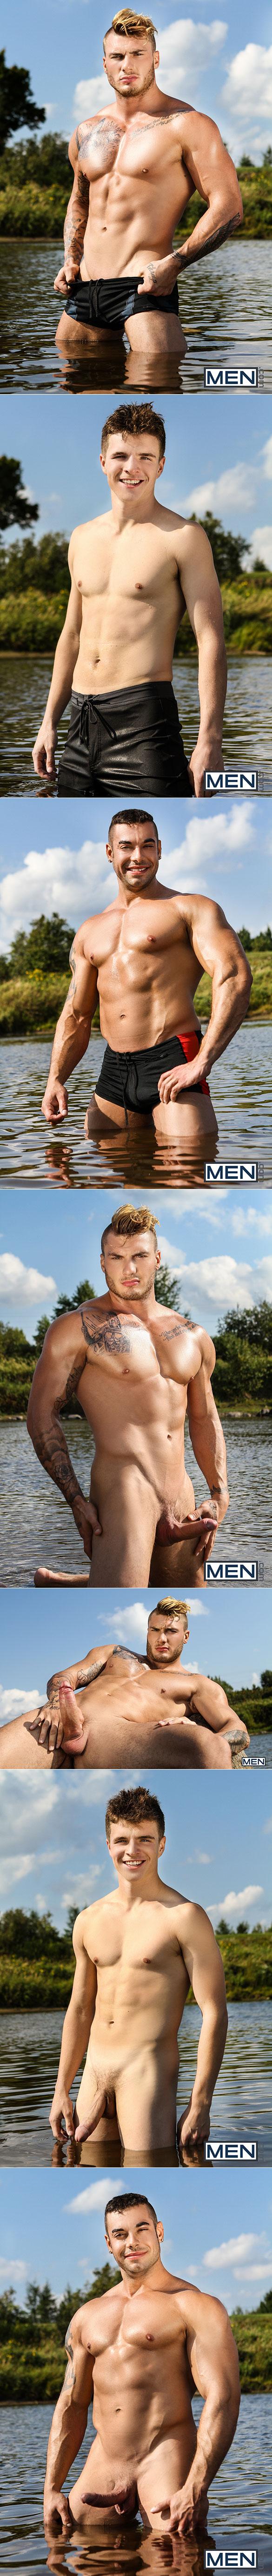 "Men.com: William Seed and Jack Kross tag team Bellamy Bradley in ""Skin Diving"""